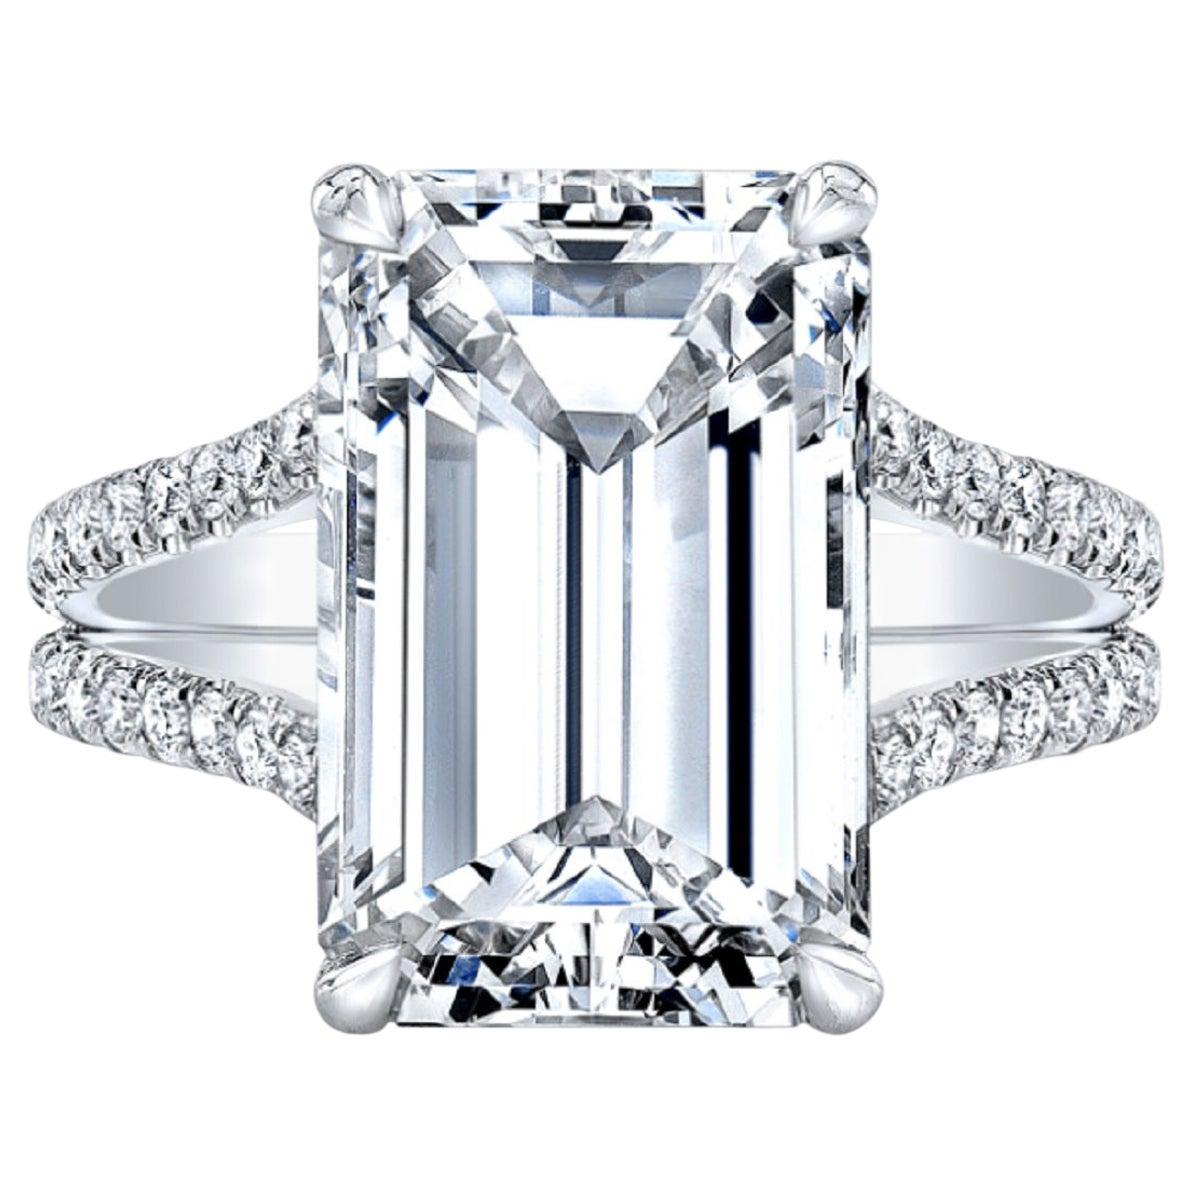 10.02 Carat HRD Certified Emerald Cut Diamond Ring VS1 Clarity 3 Ex